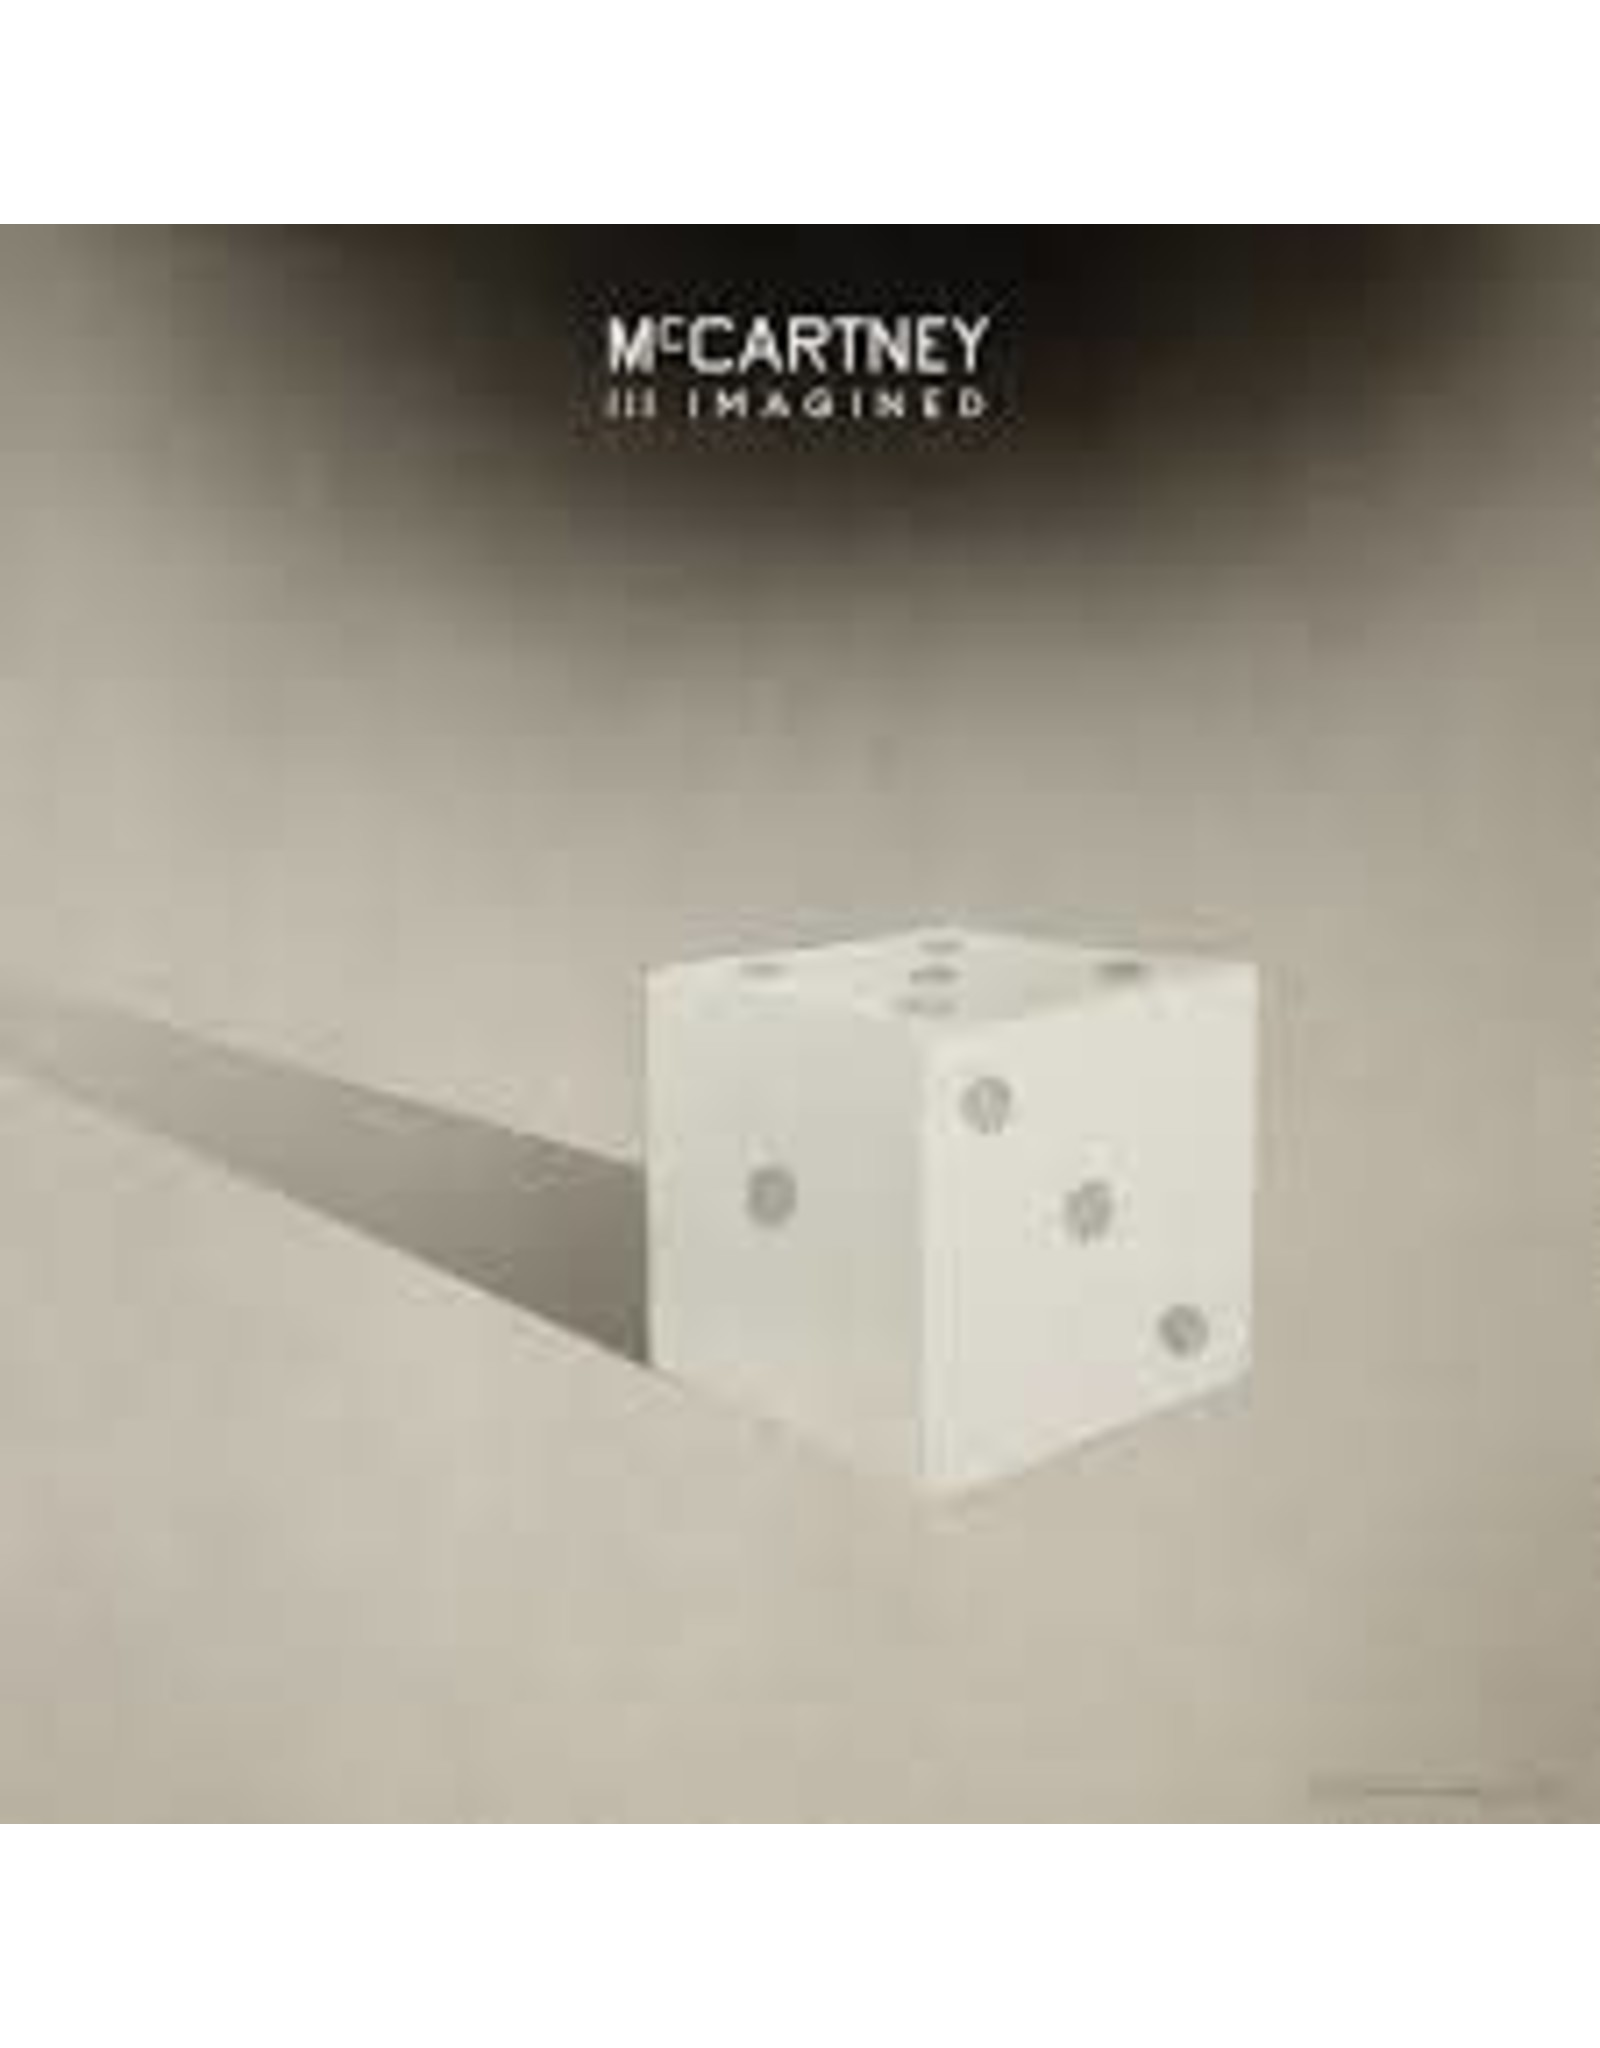 McCartney, Paul - III Imagined LP (Gold Vinyl)